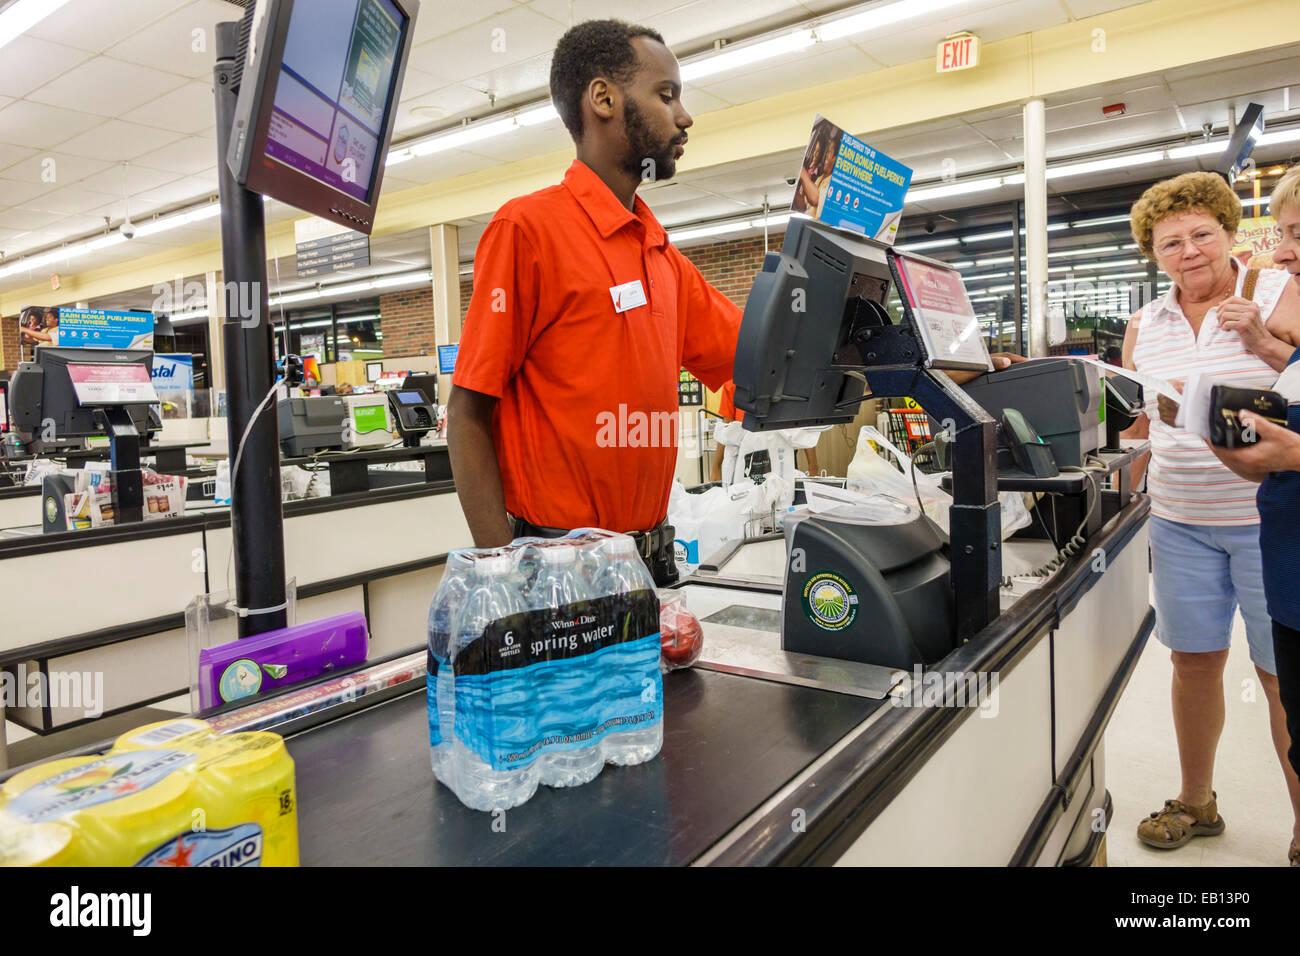 Winn dixie grocery store supermarket inside stock photo royalty free